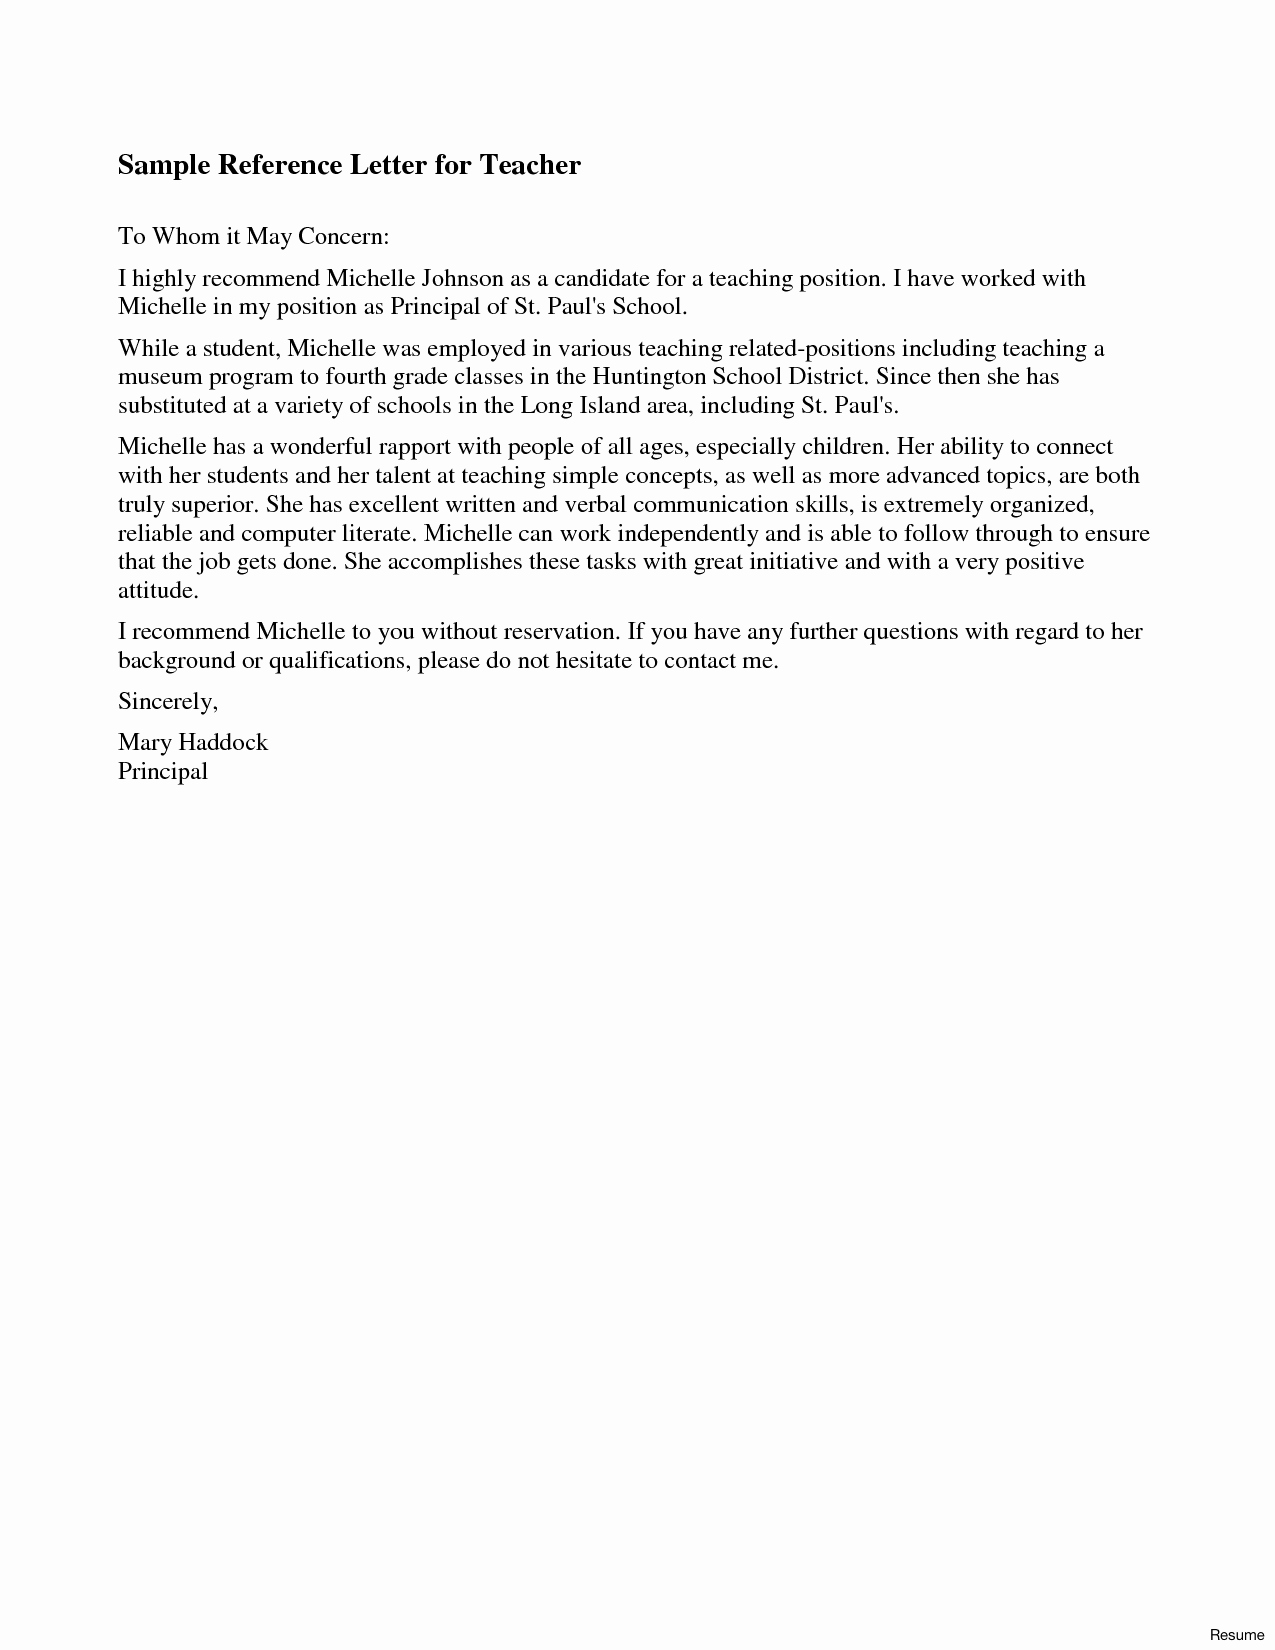 Teacher Letter Of Recommendation Template Unique Letter Re Mendation Example for Teaching Position